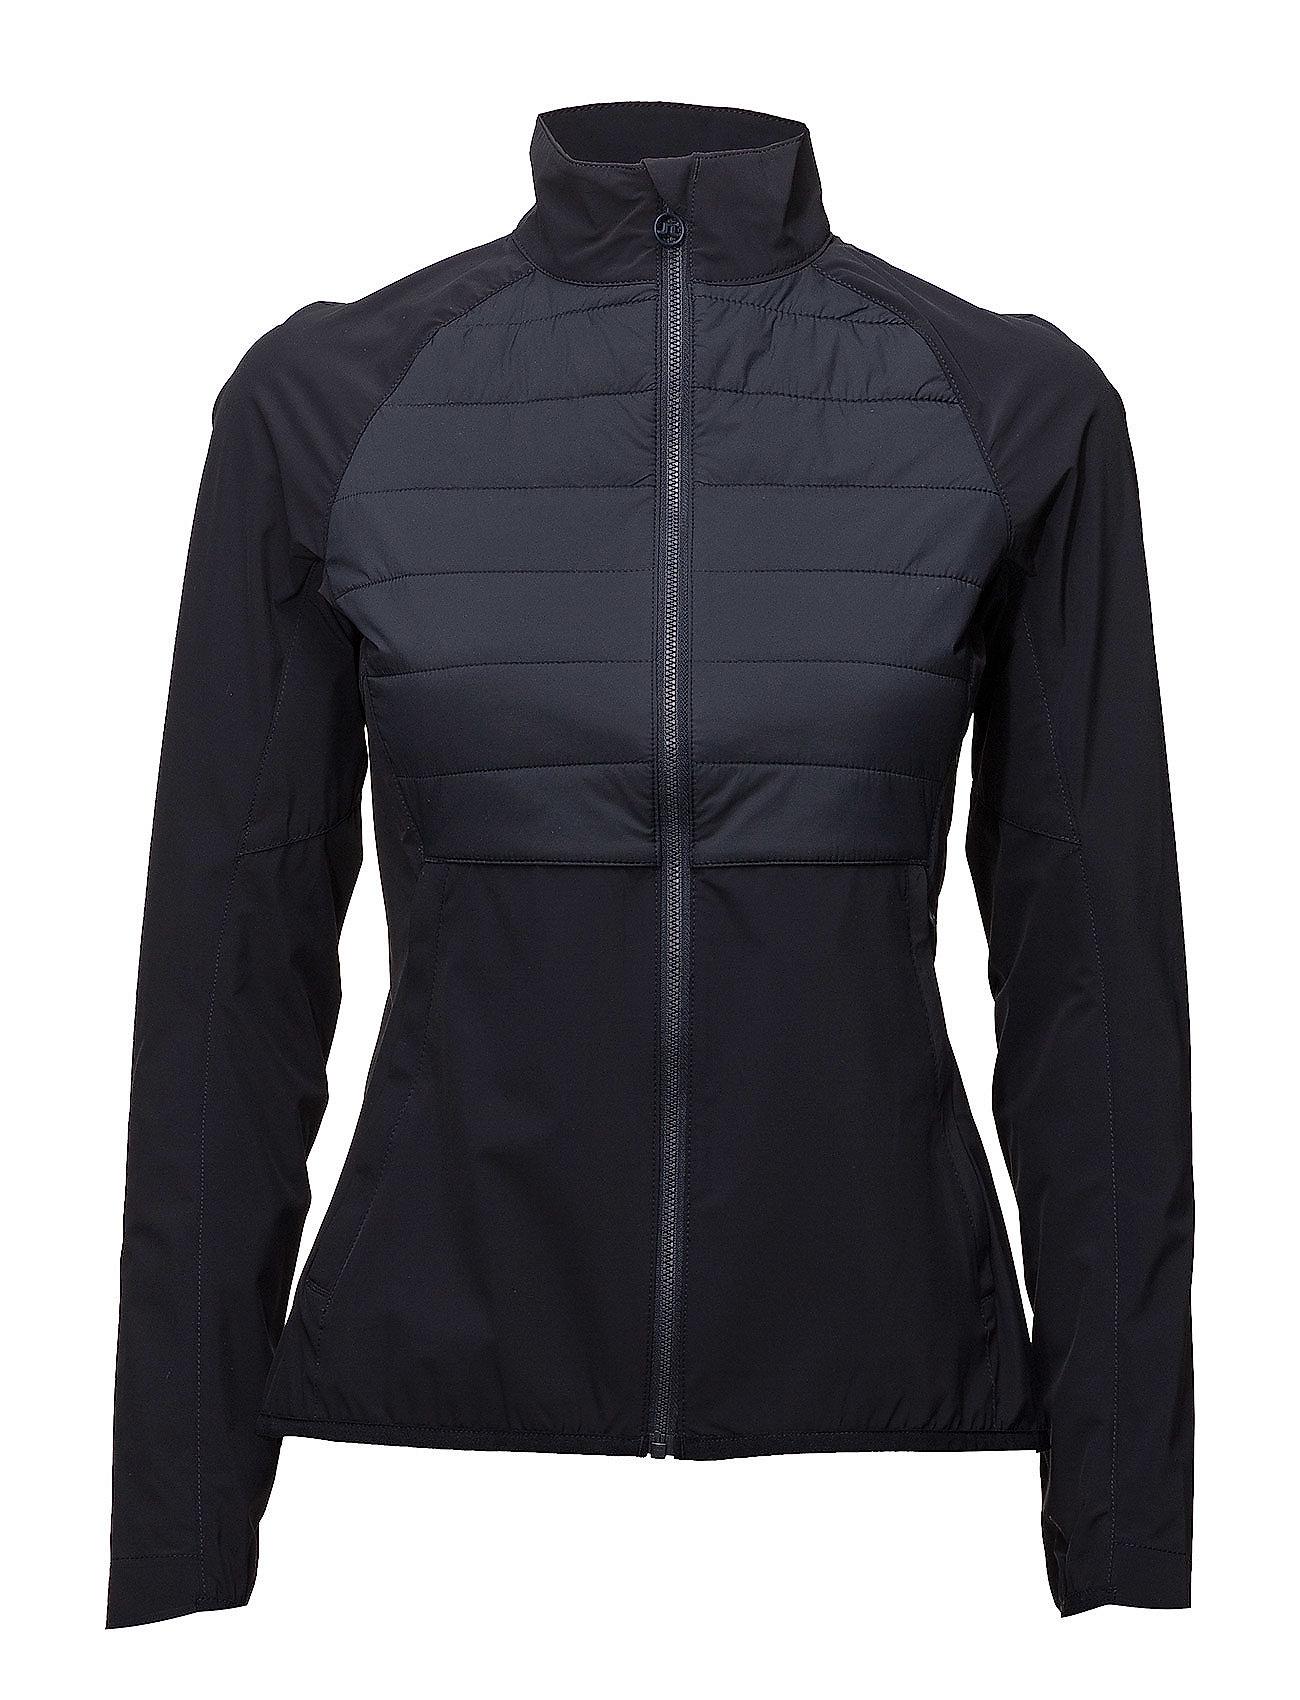 J. Lindeberg W Hybrid Jacket Lux Softshell Ytterkläder